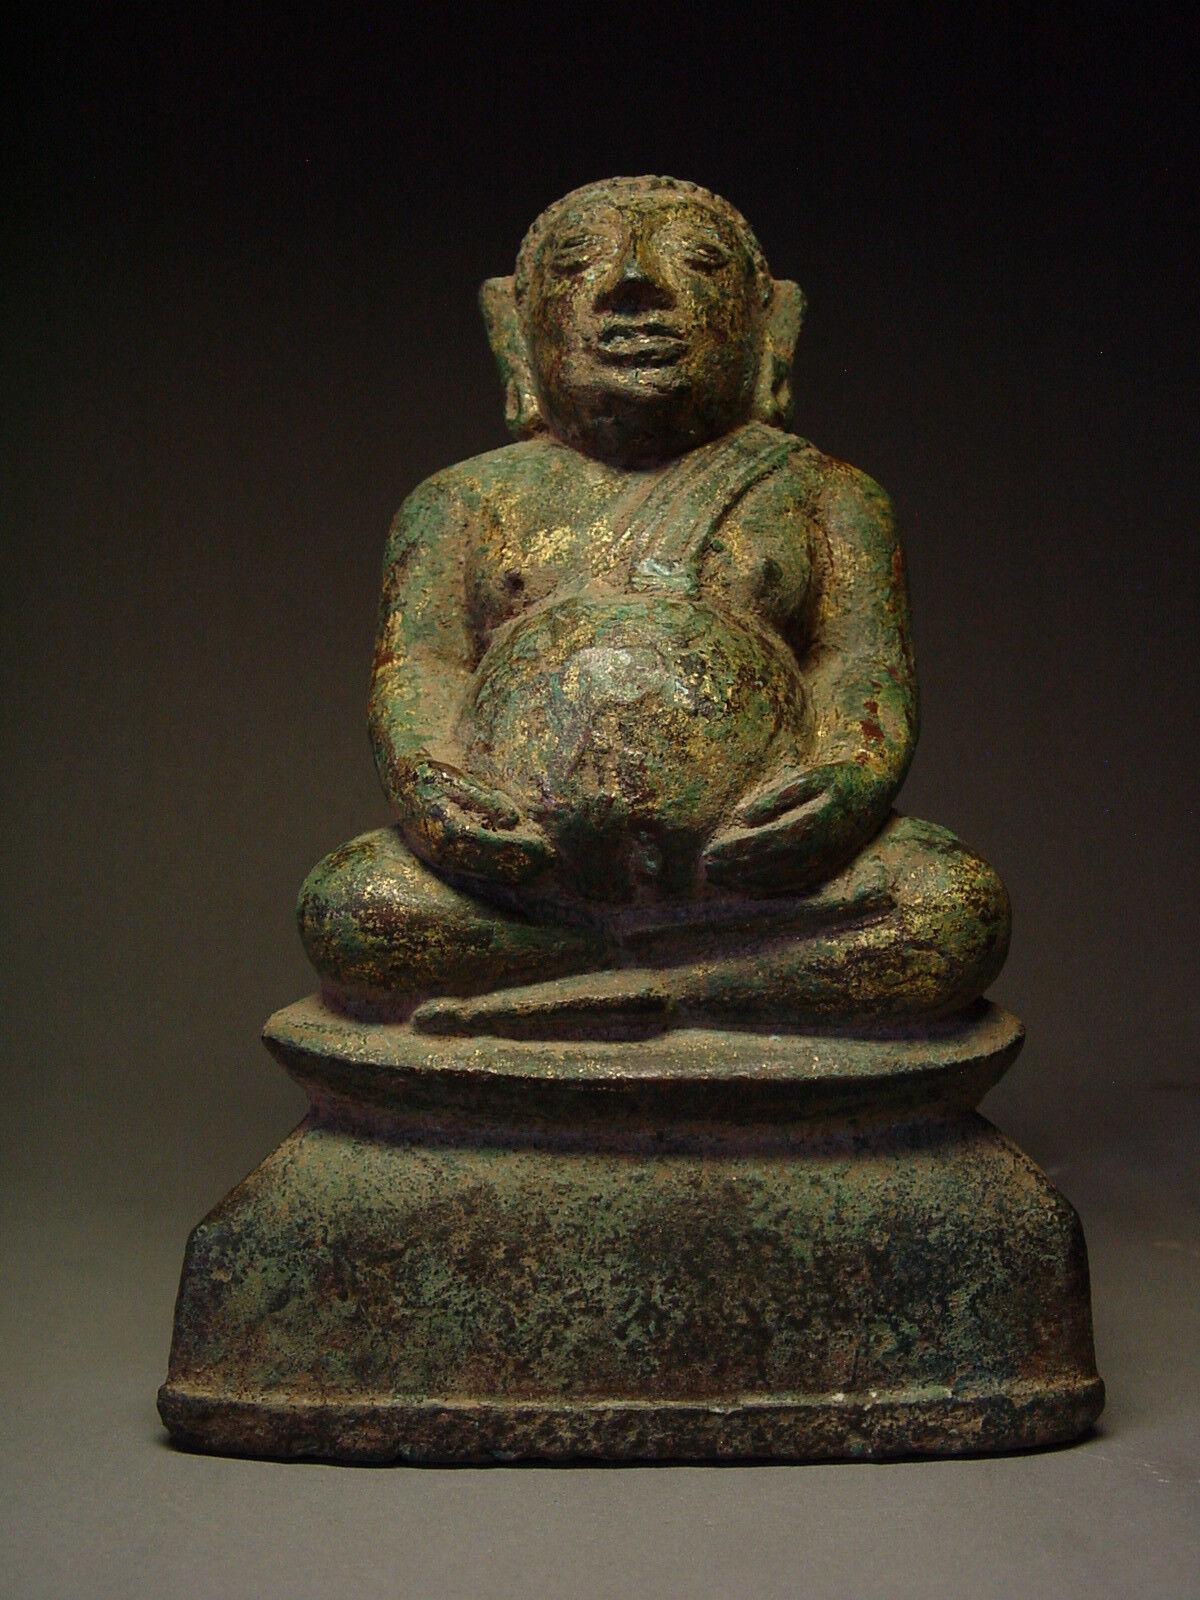 RARE SOUTHEAST ASIA GILDED BRONZE BUDDHIST DISCIPLE 'PHRA SANGKAJAI' 18th C.